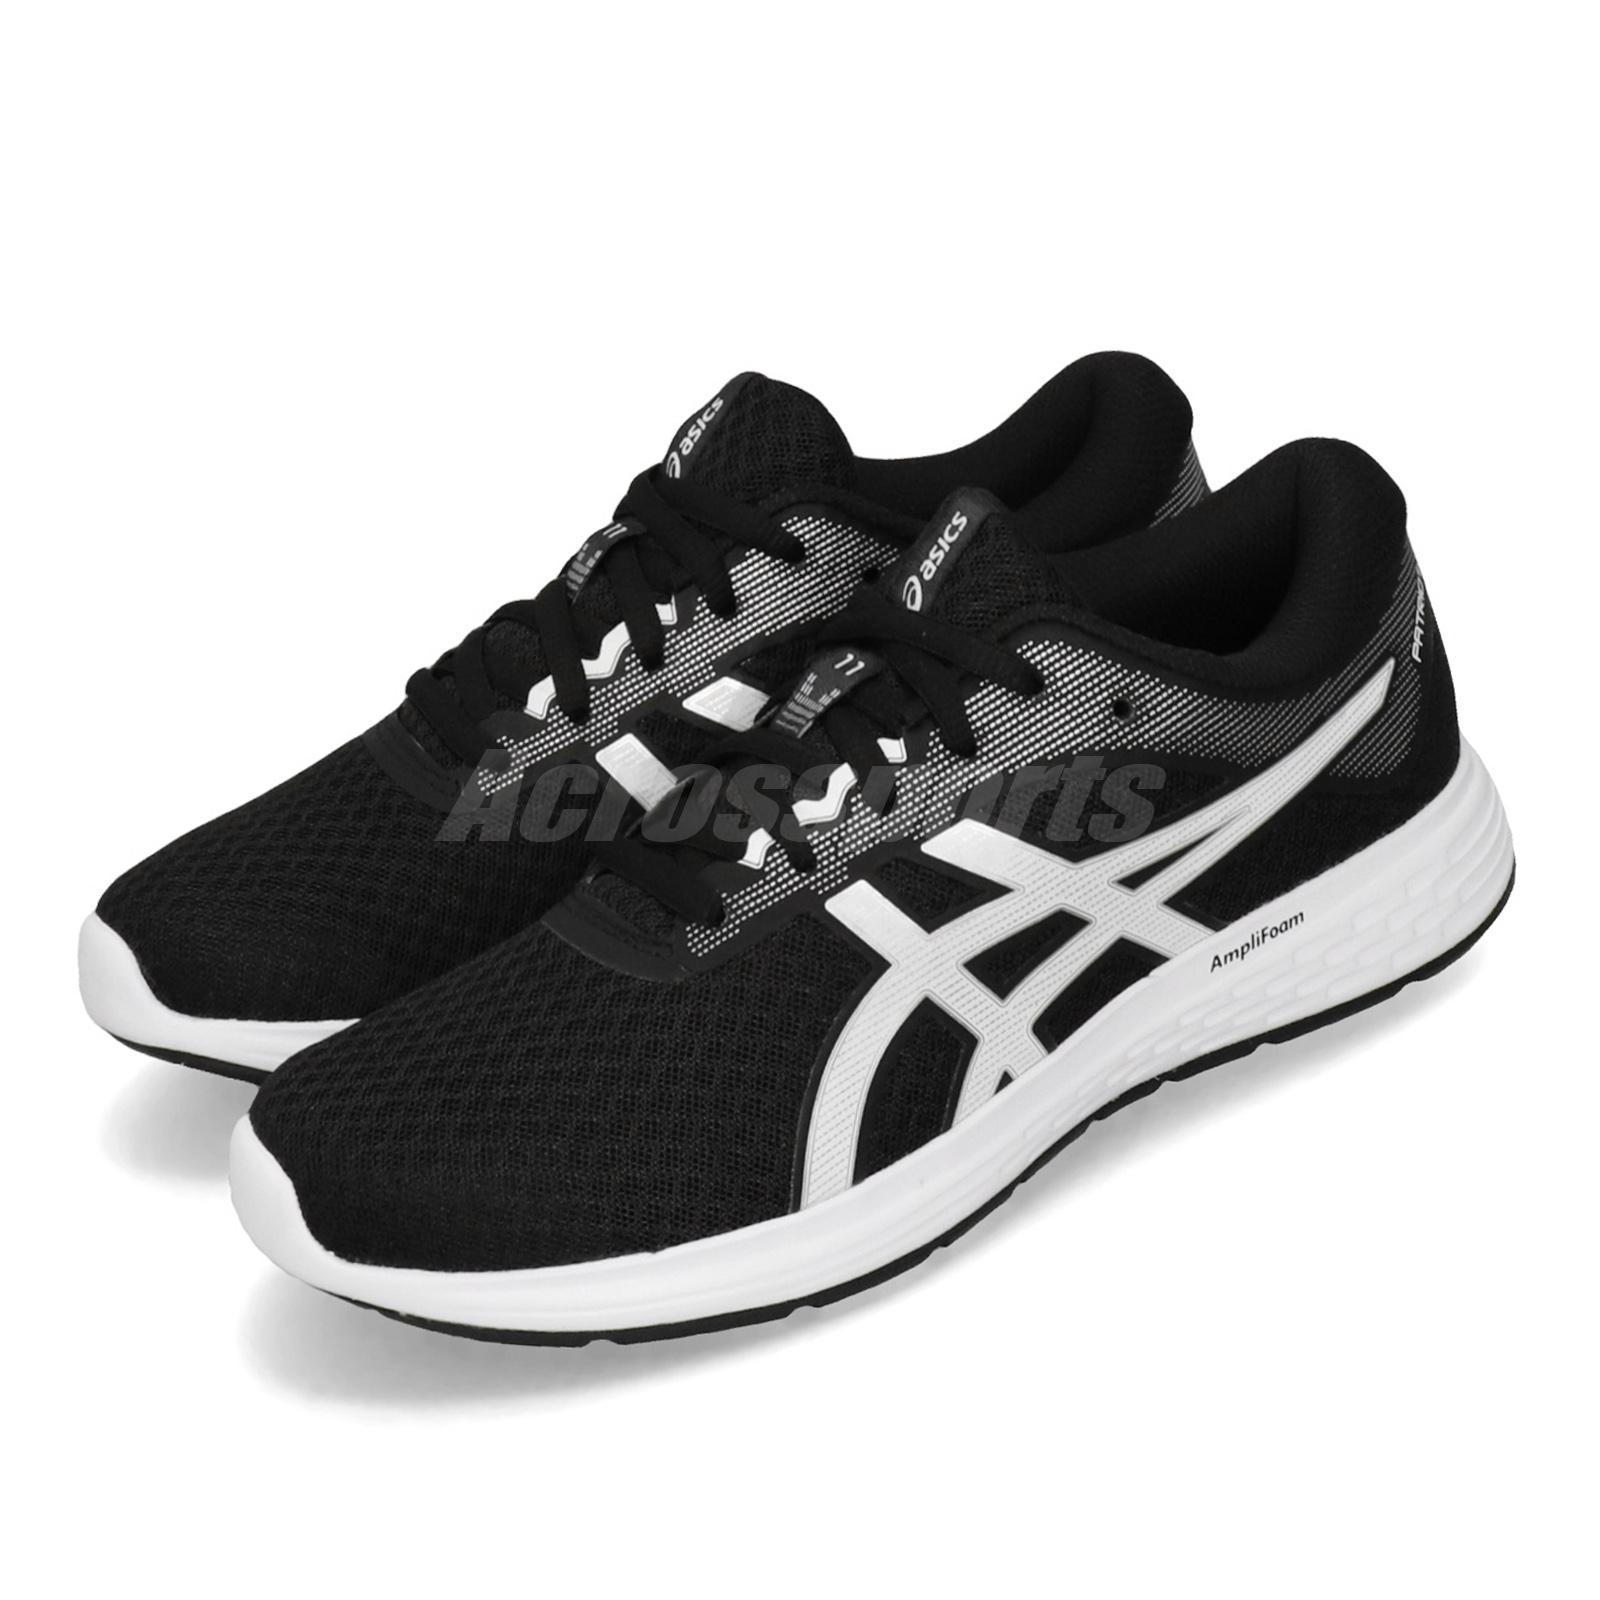 asics patriot 8 womens running shoes review original